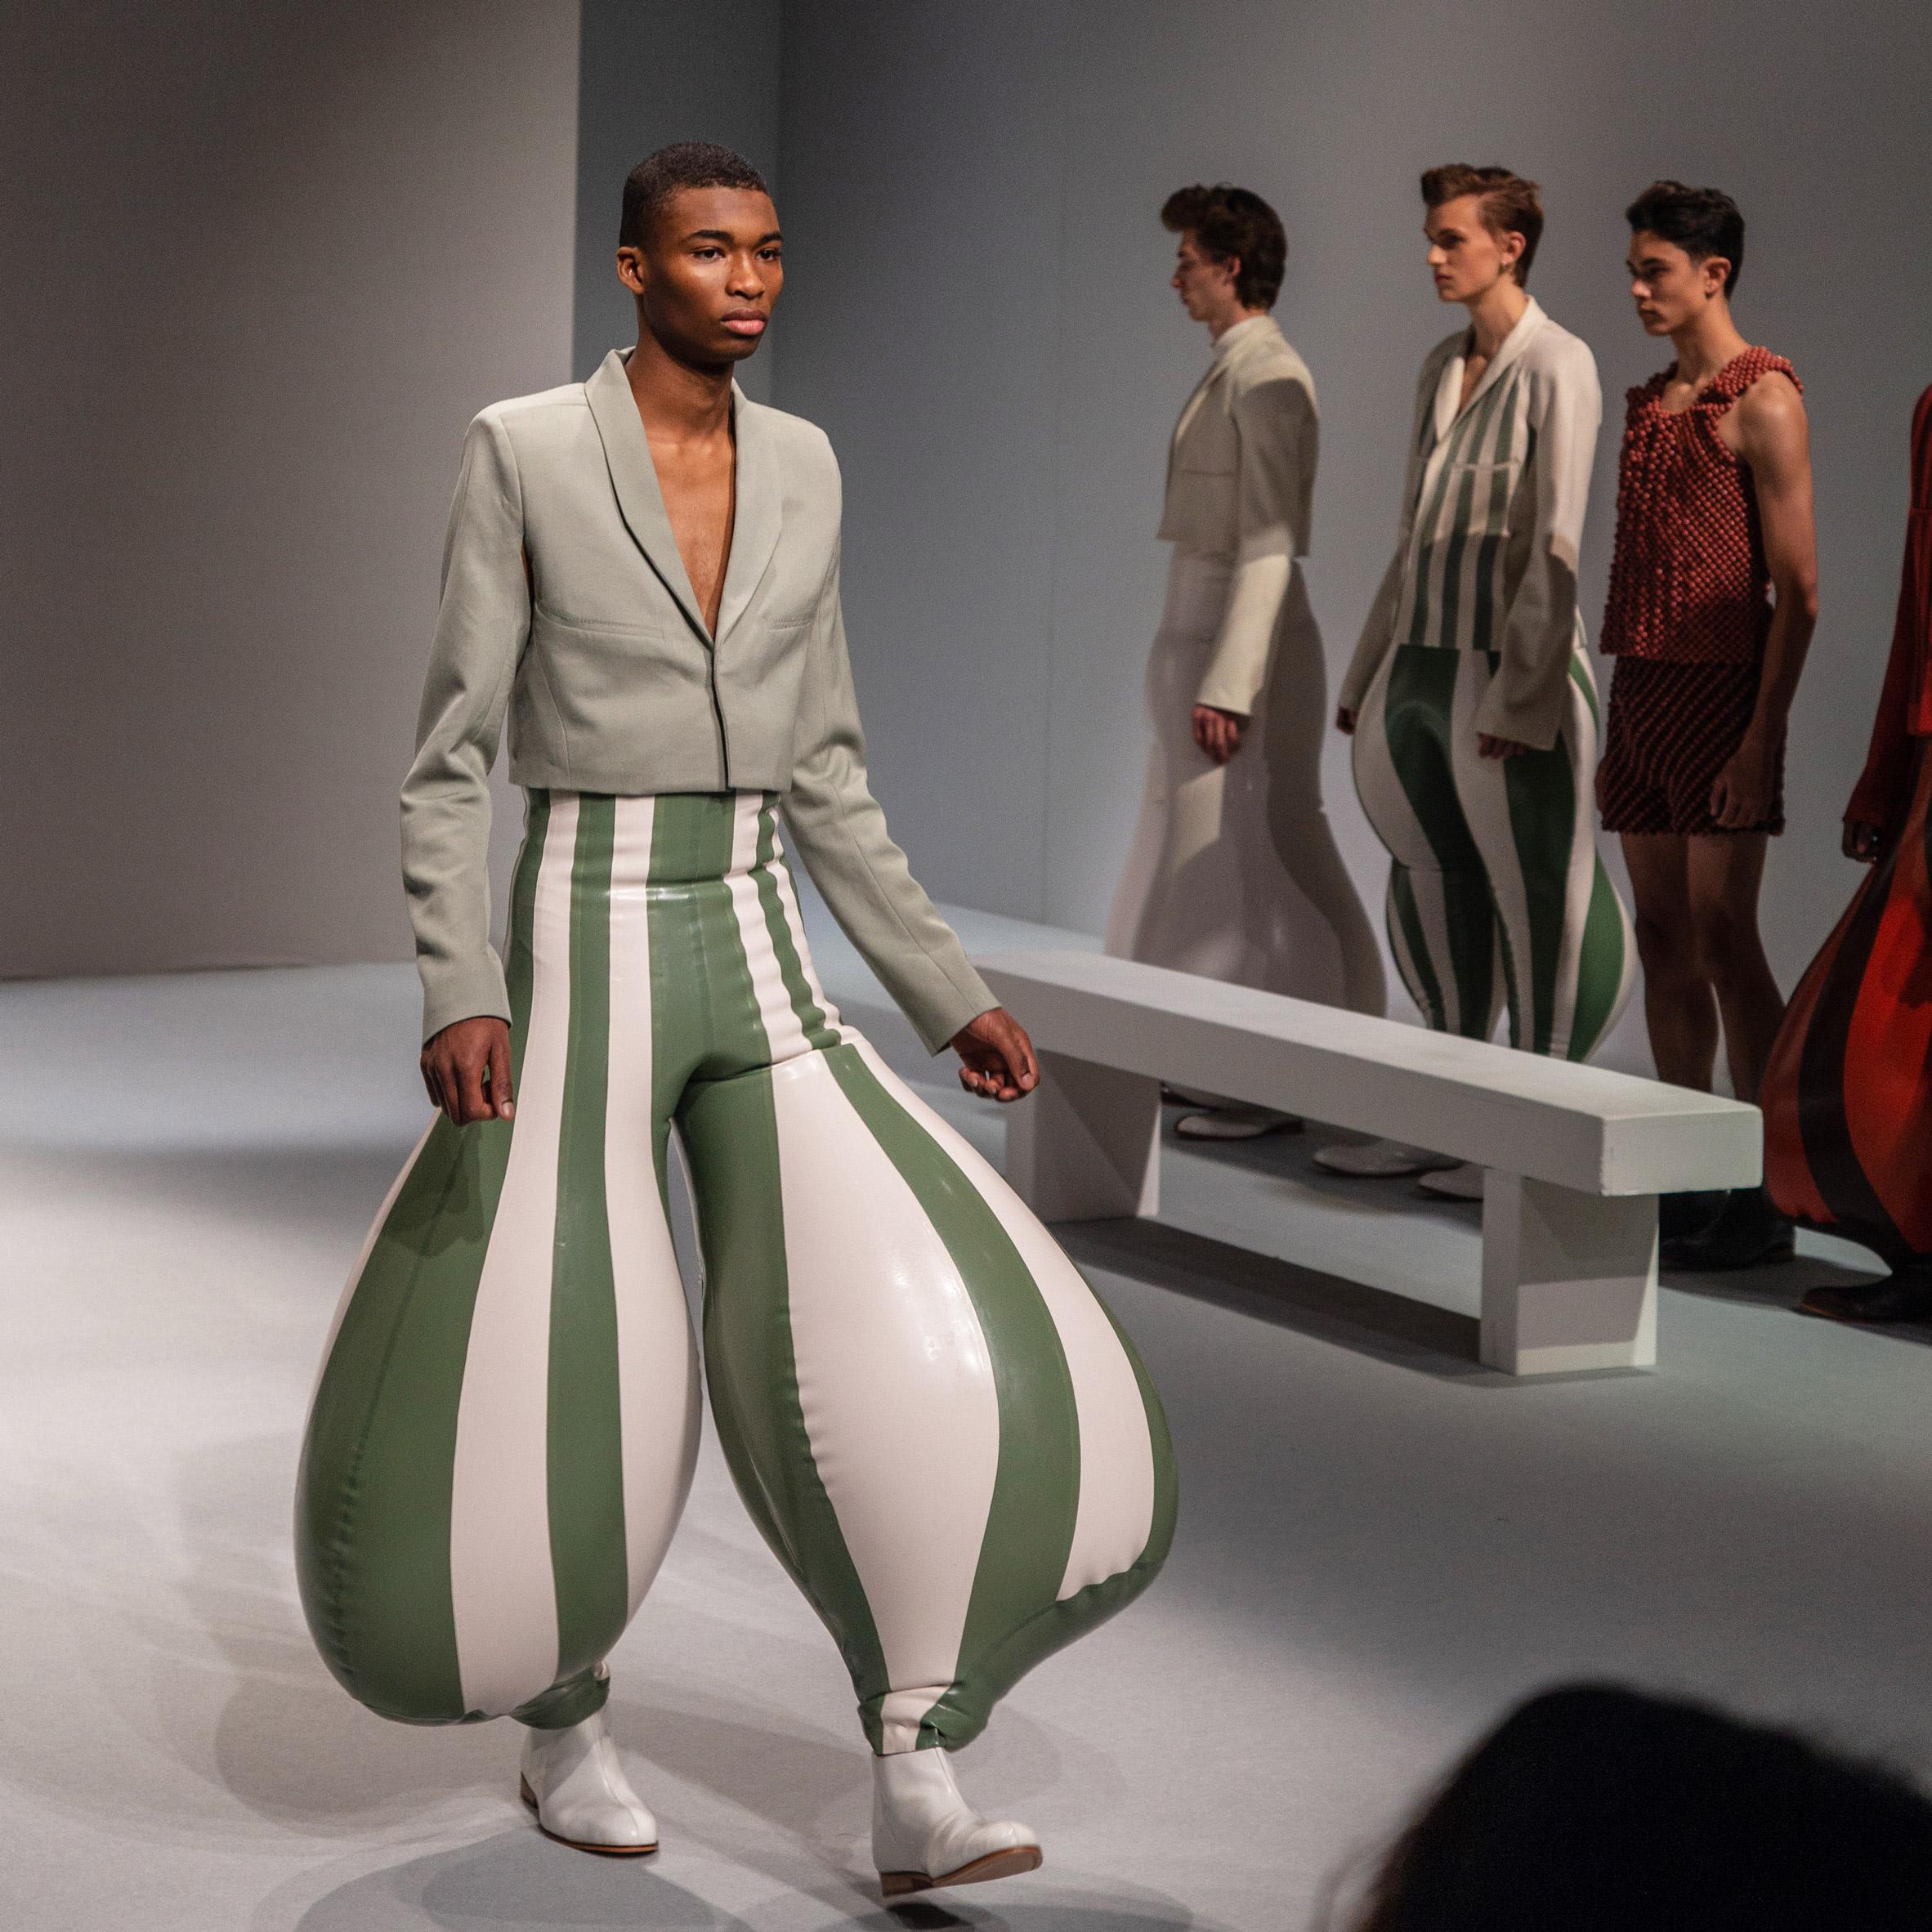 Harikrishnan's inflatable latex fashion creates